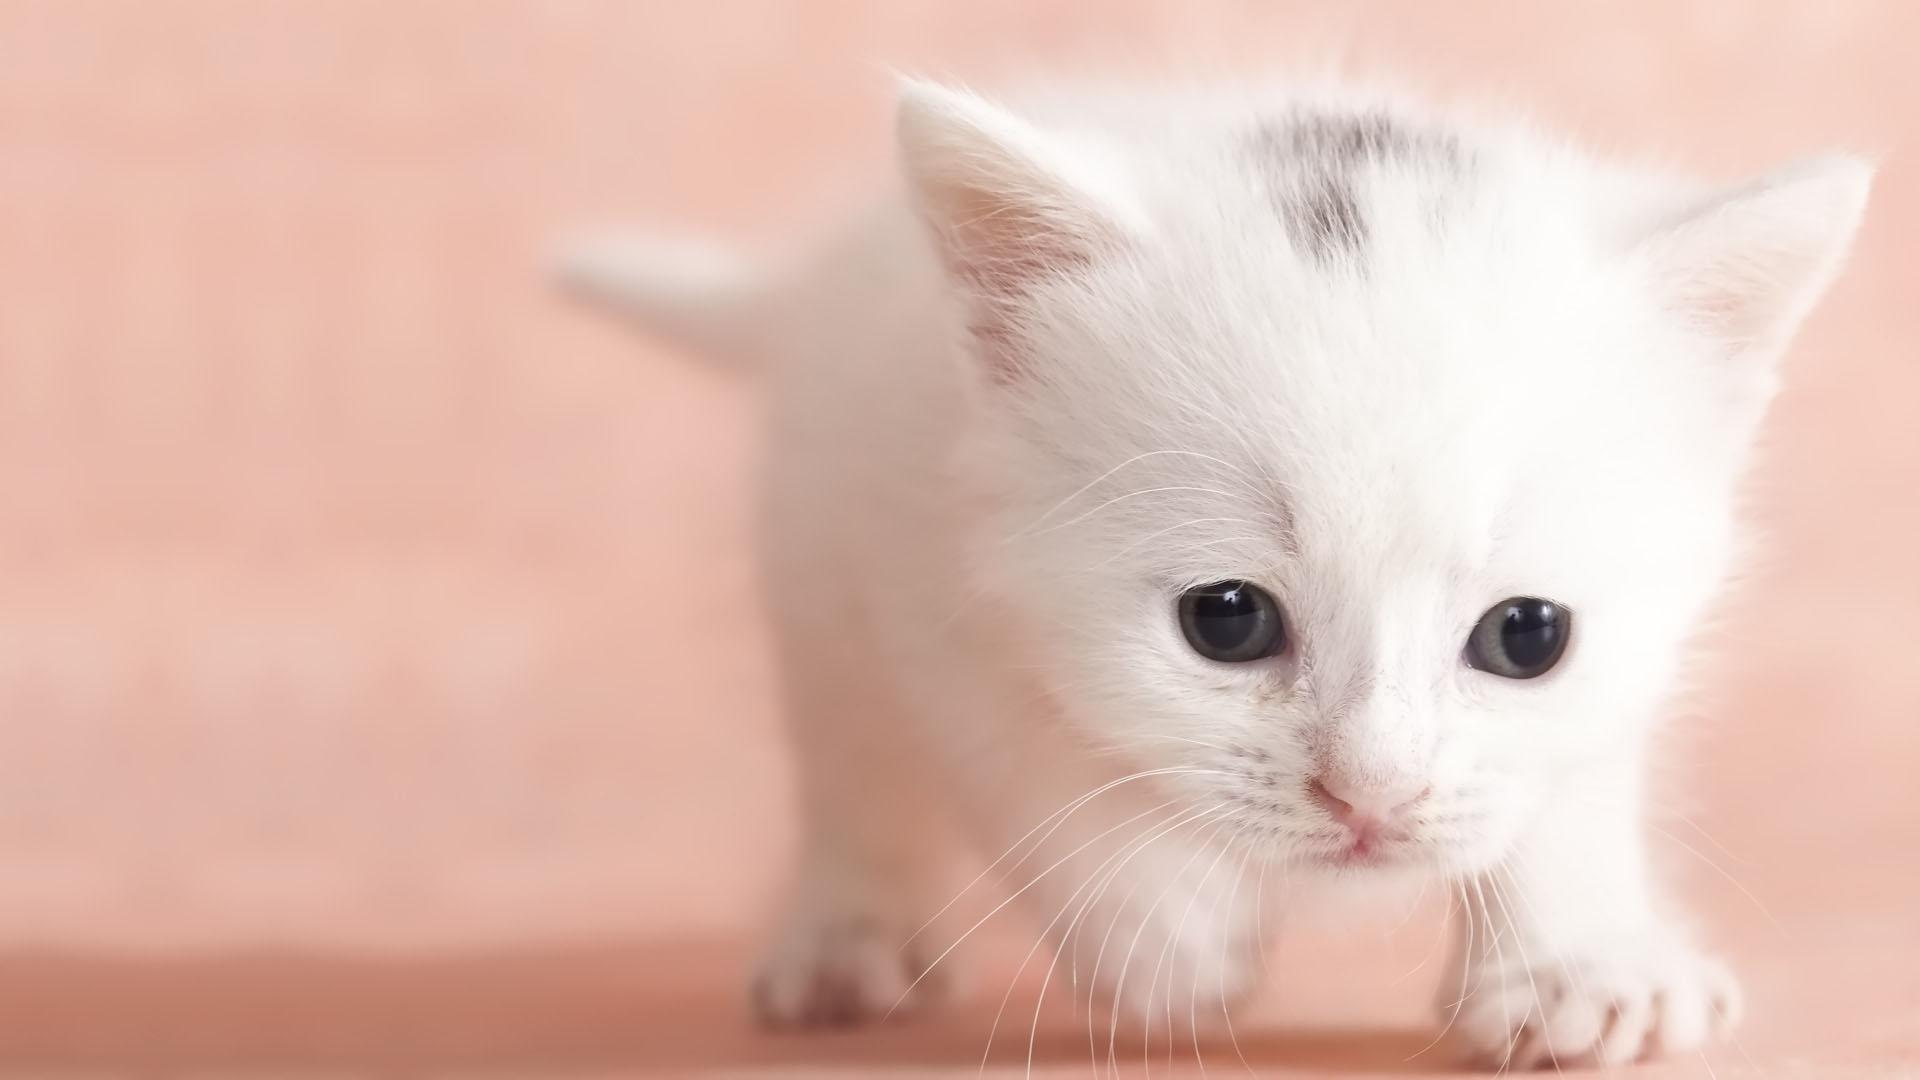 Cute Baby Cats Wallpaper Posted By John Mercado